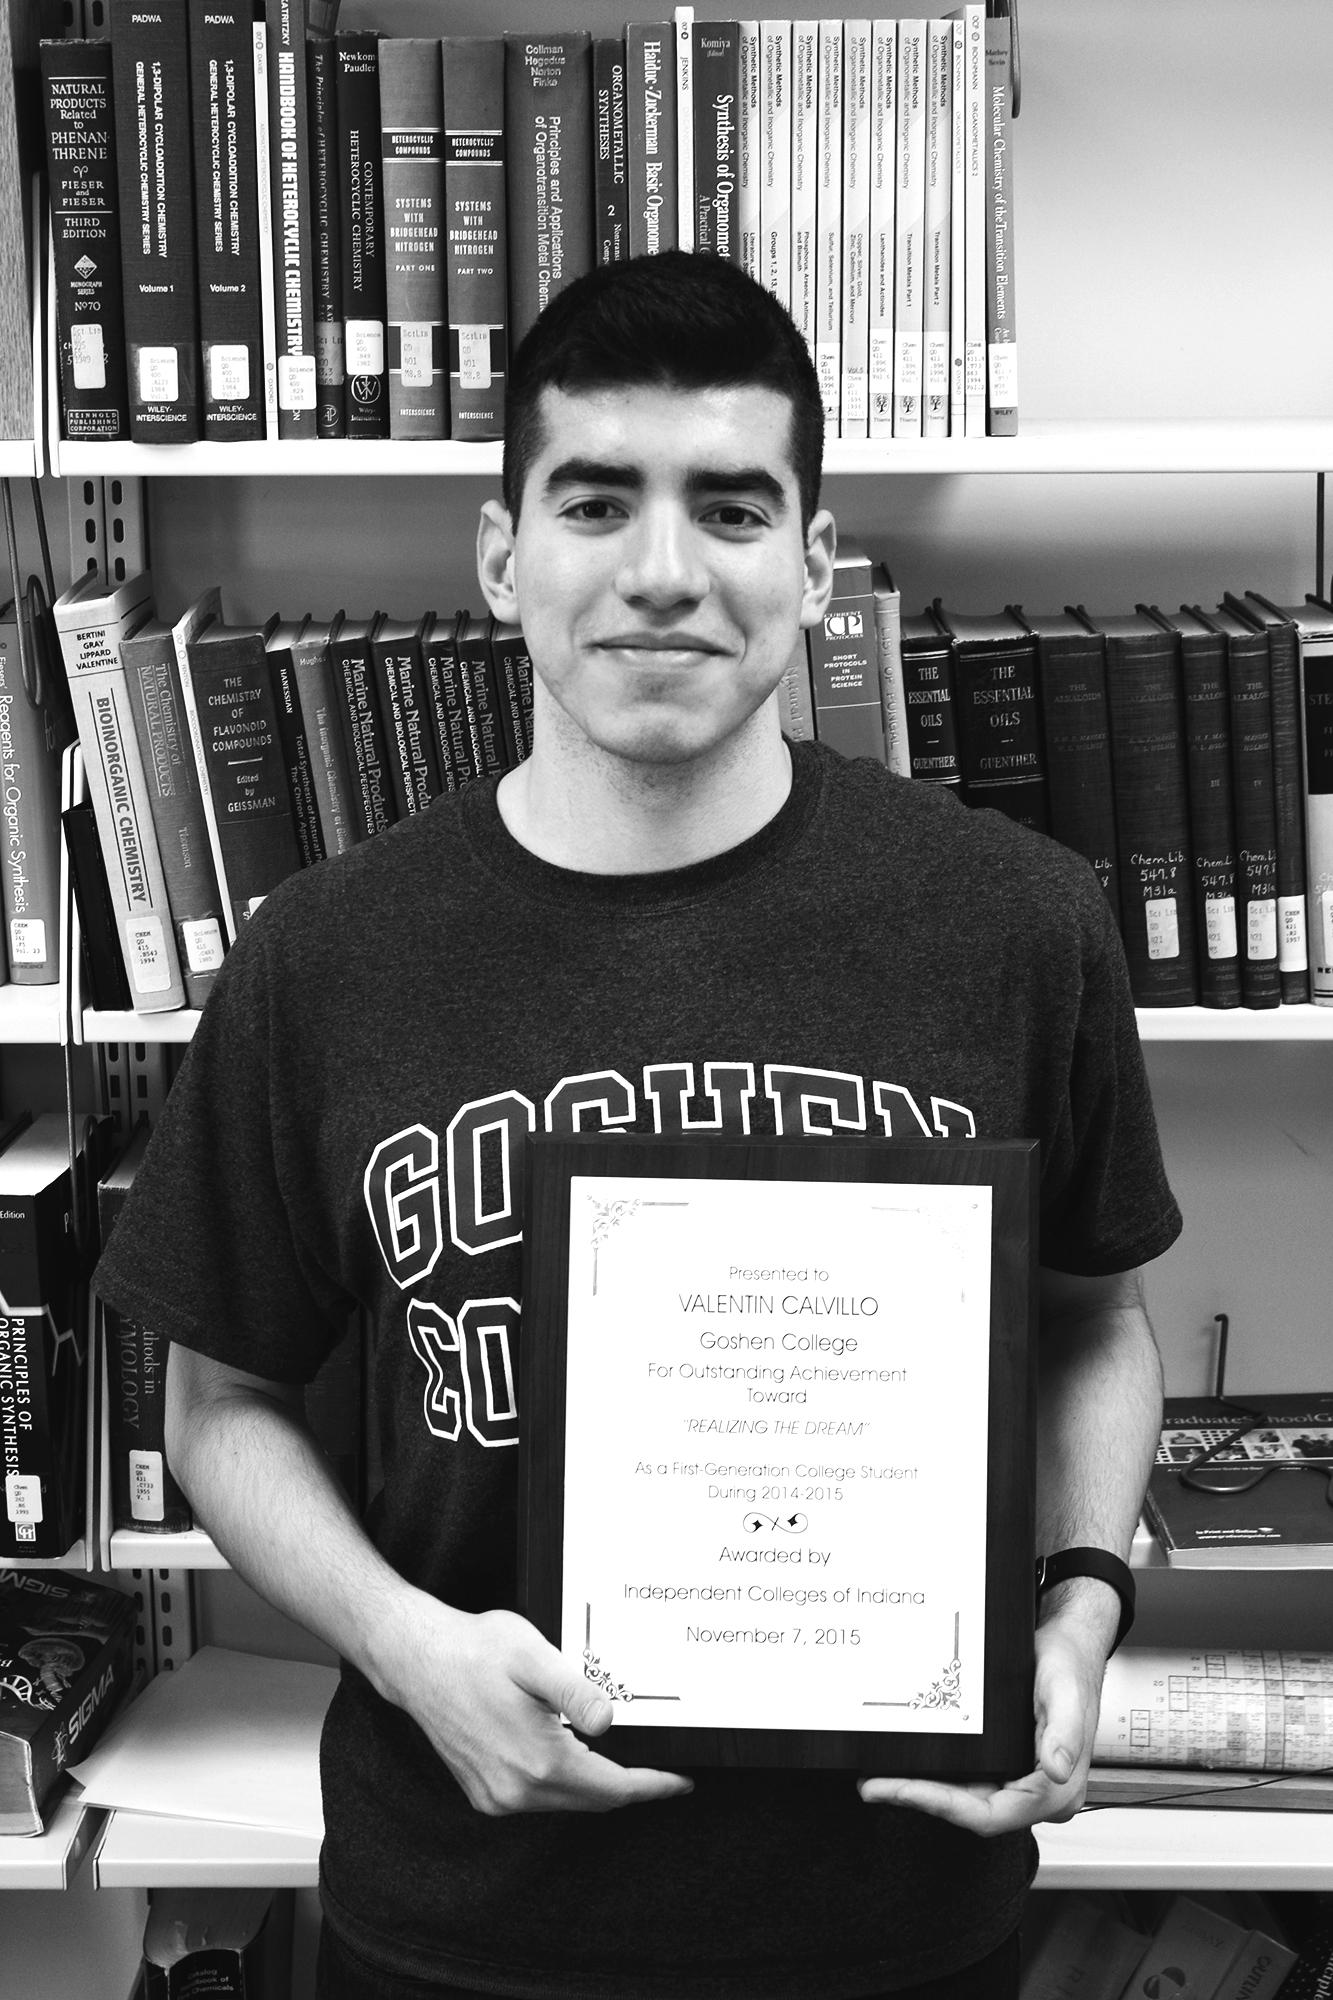 Valentin Calvillo poses with certificate